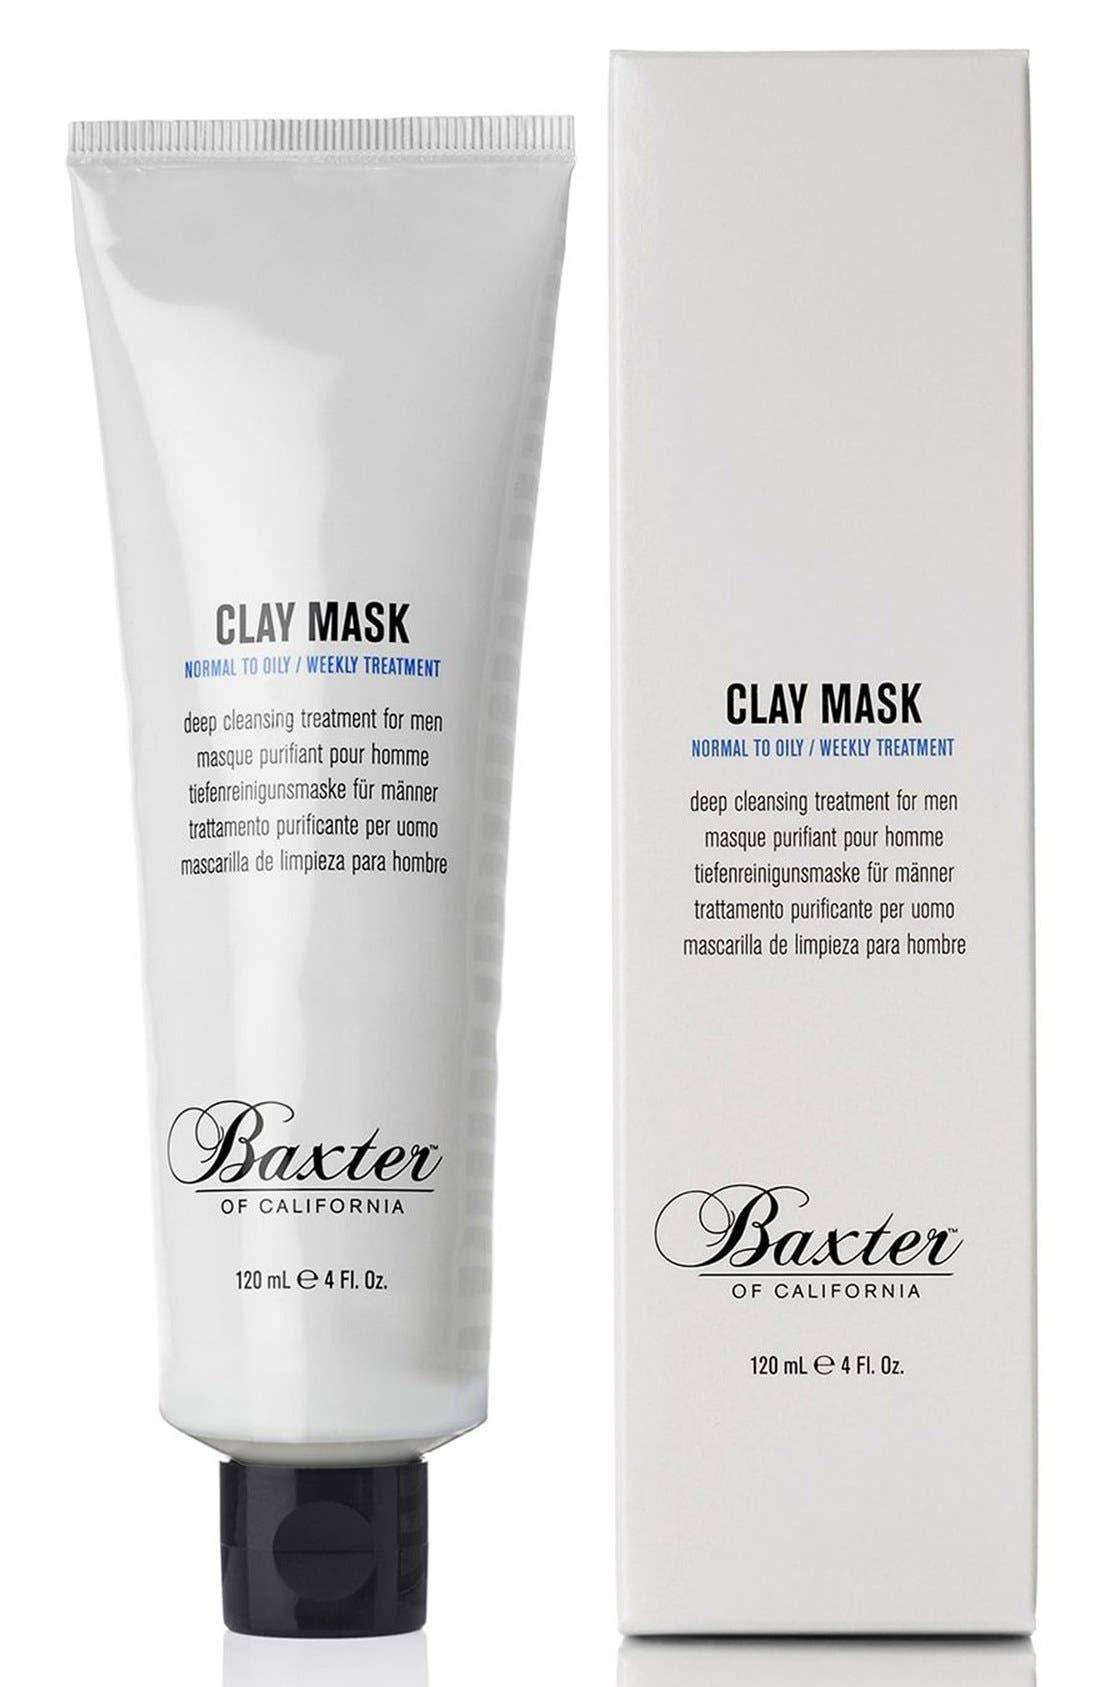 Baxter of California Clay Mask